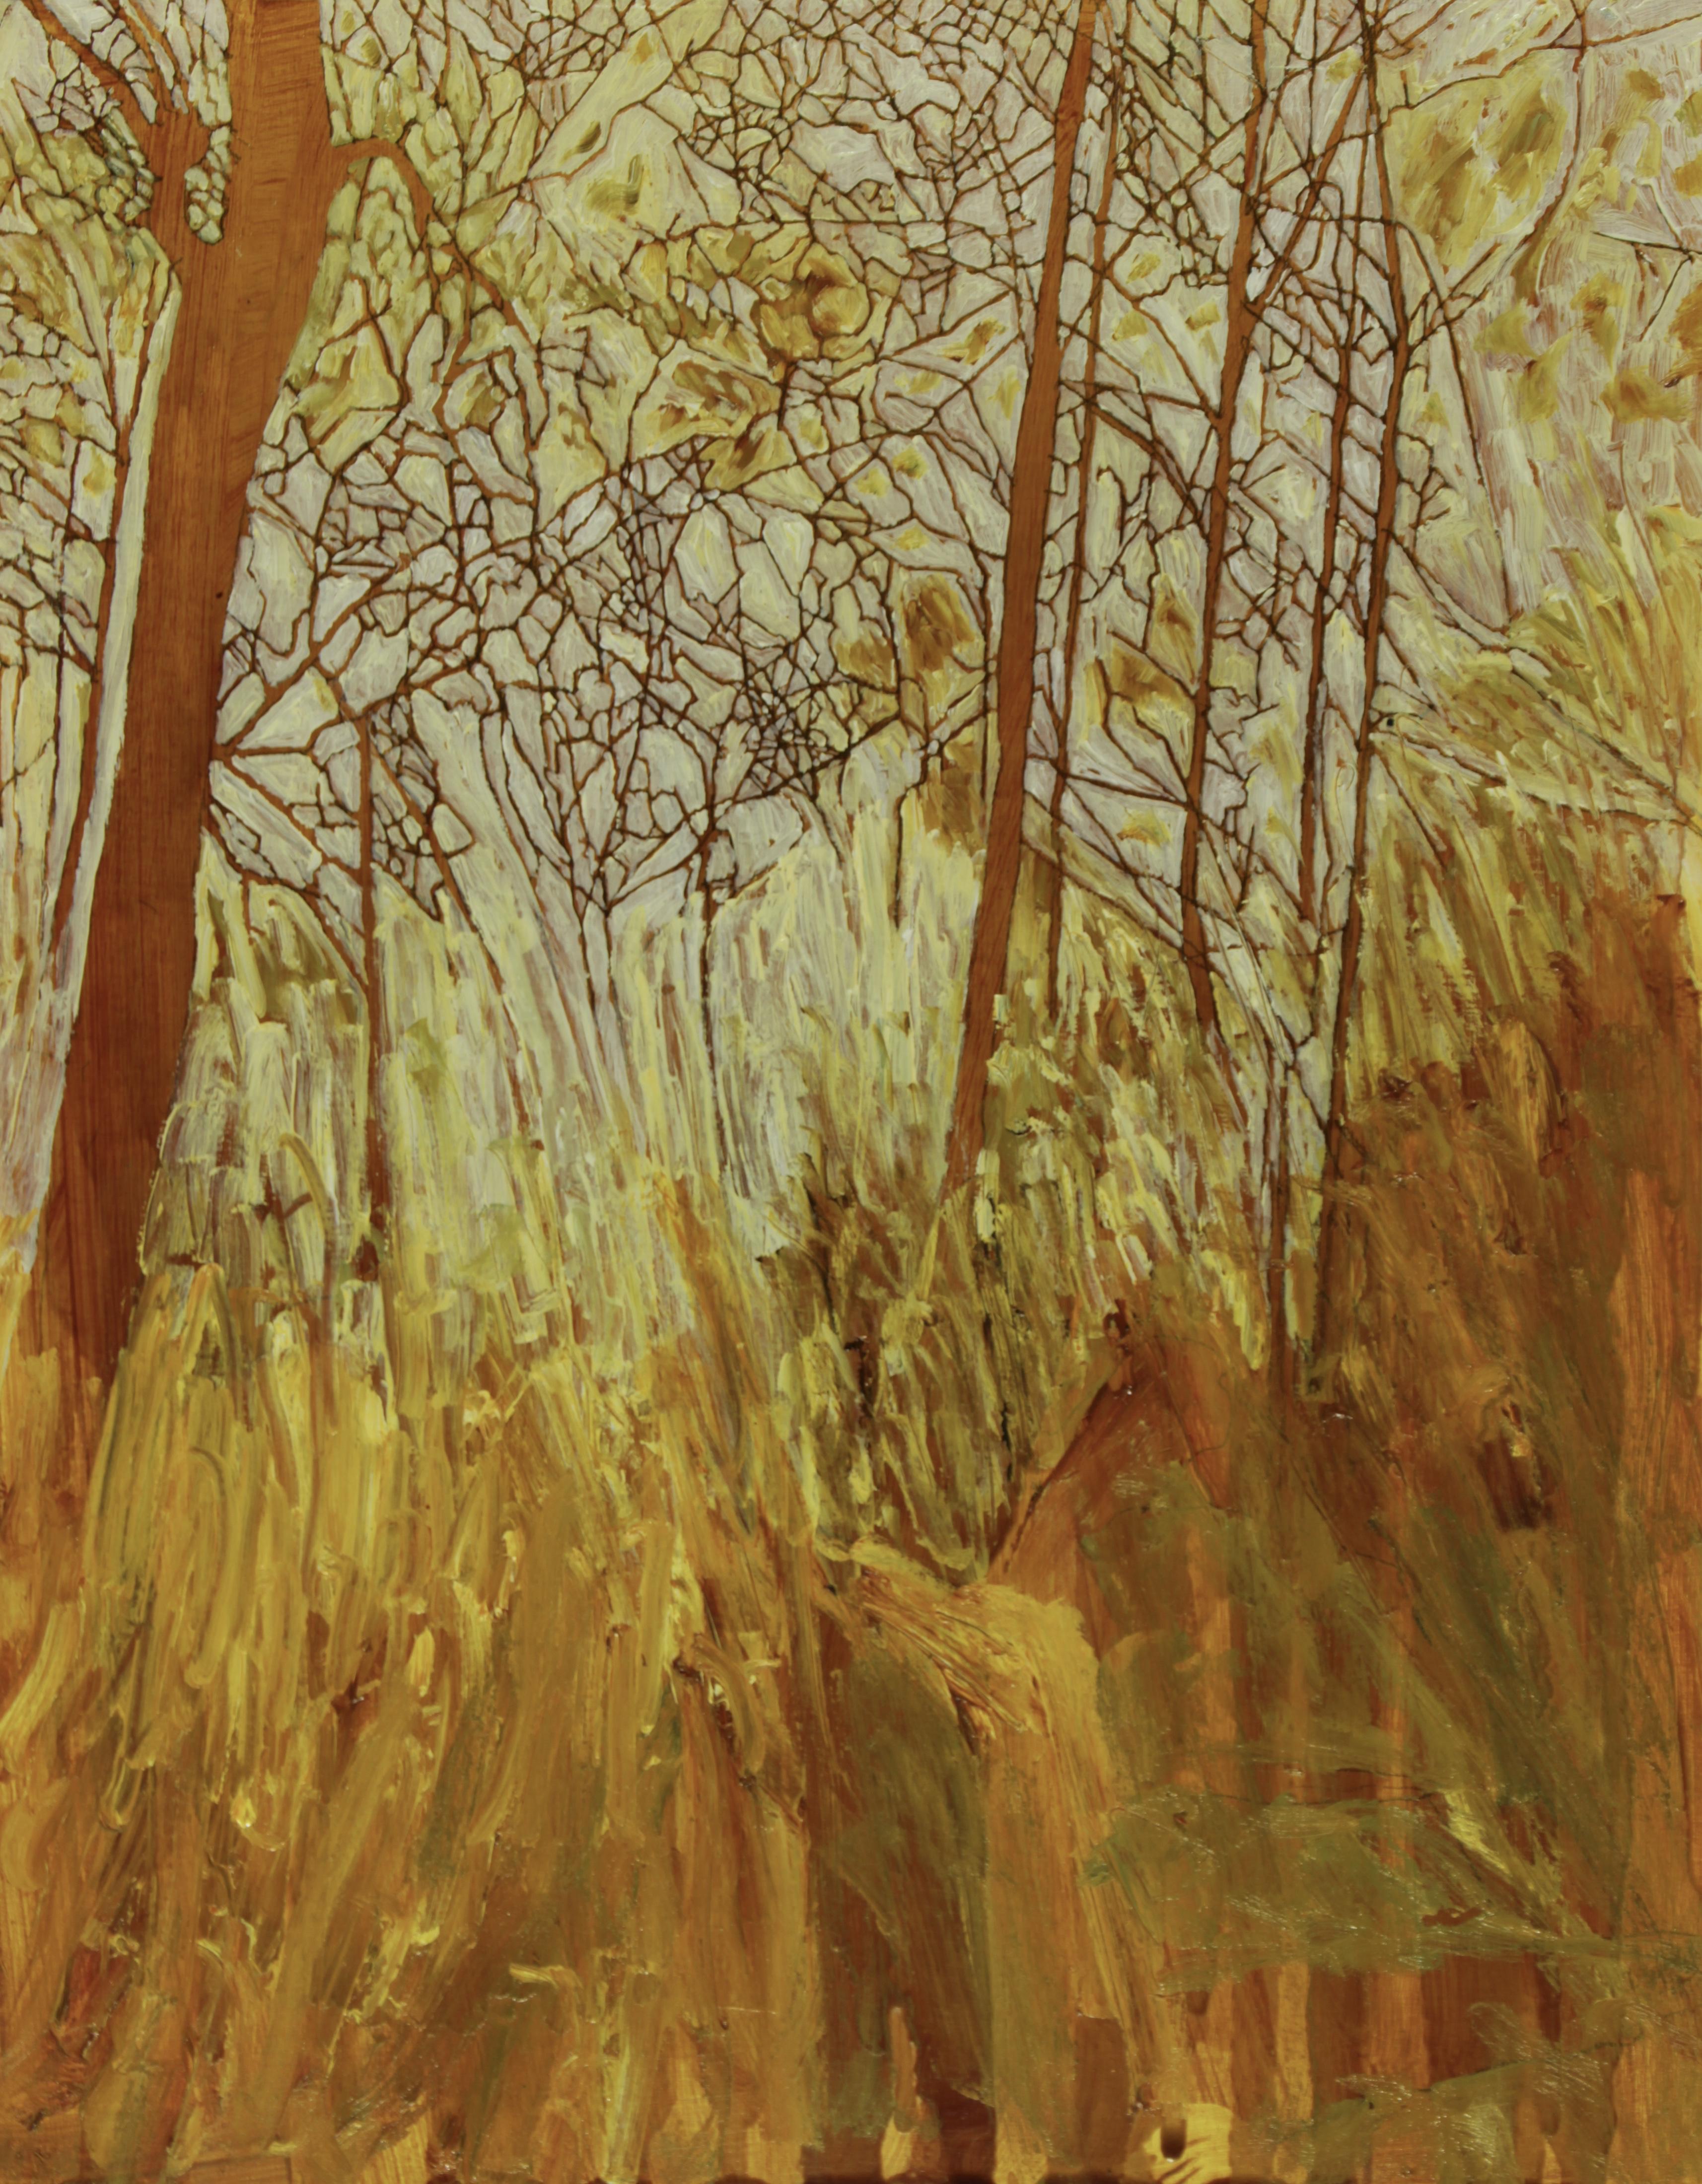 Grassy space, Watagans, 35 x 28 cm